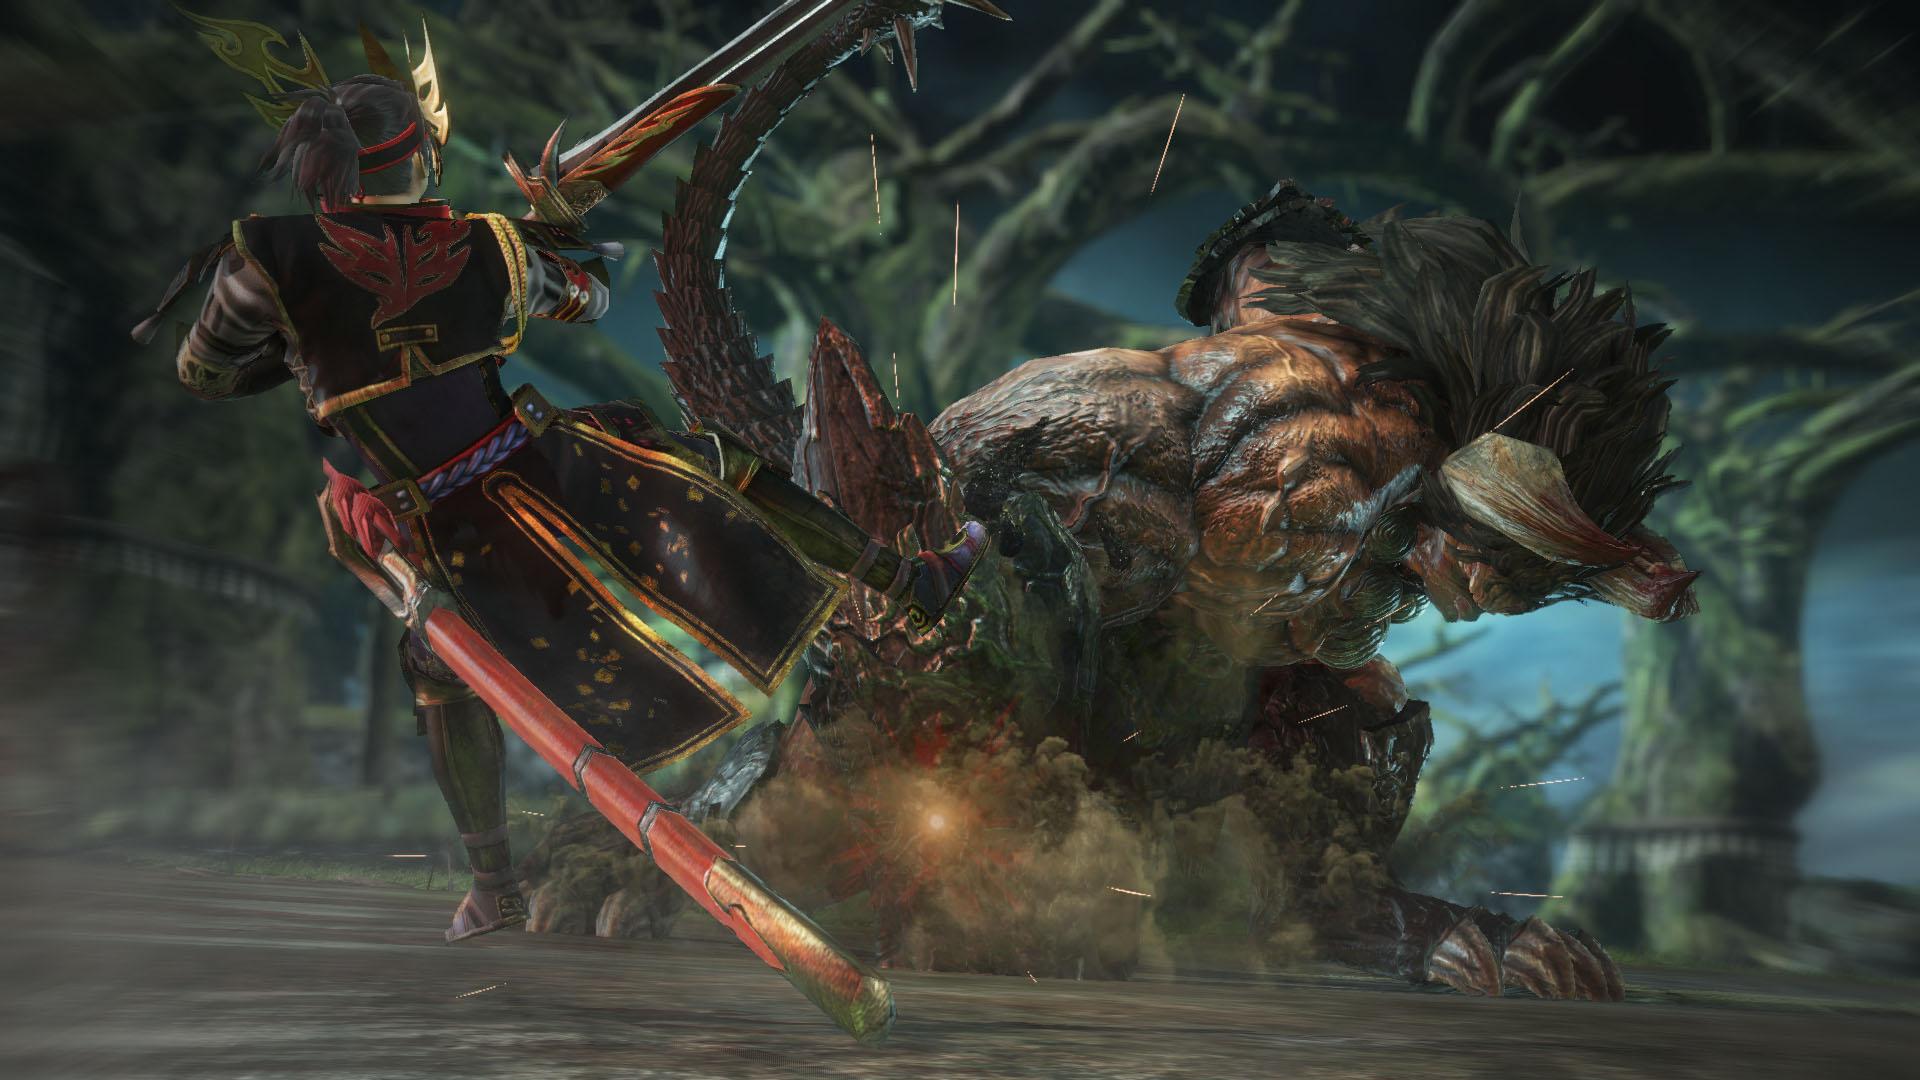 PS4版「討鬼伝 極」、体験版が4月14日に配信決定